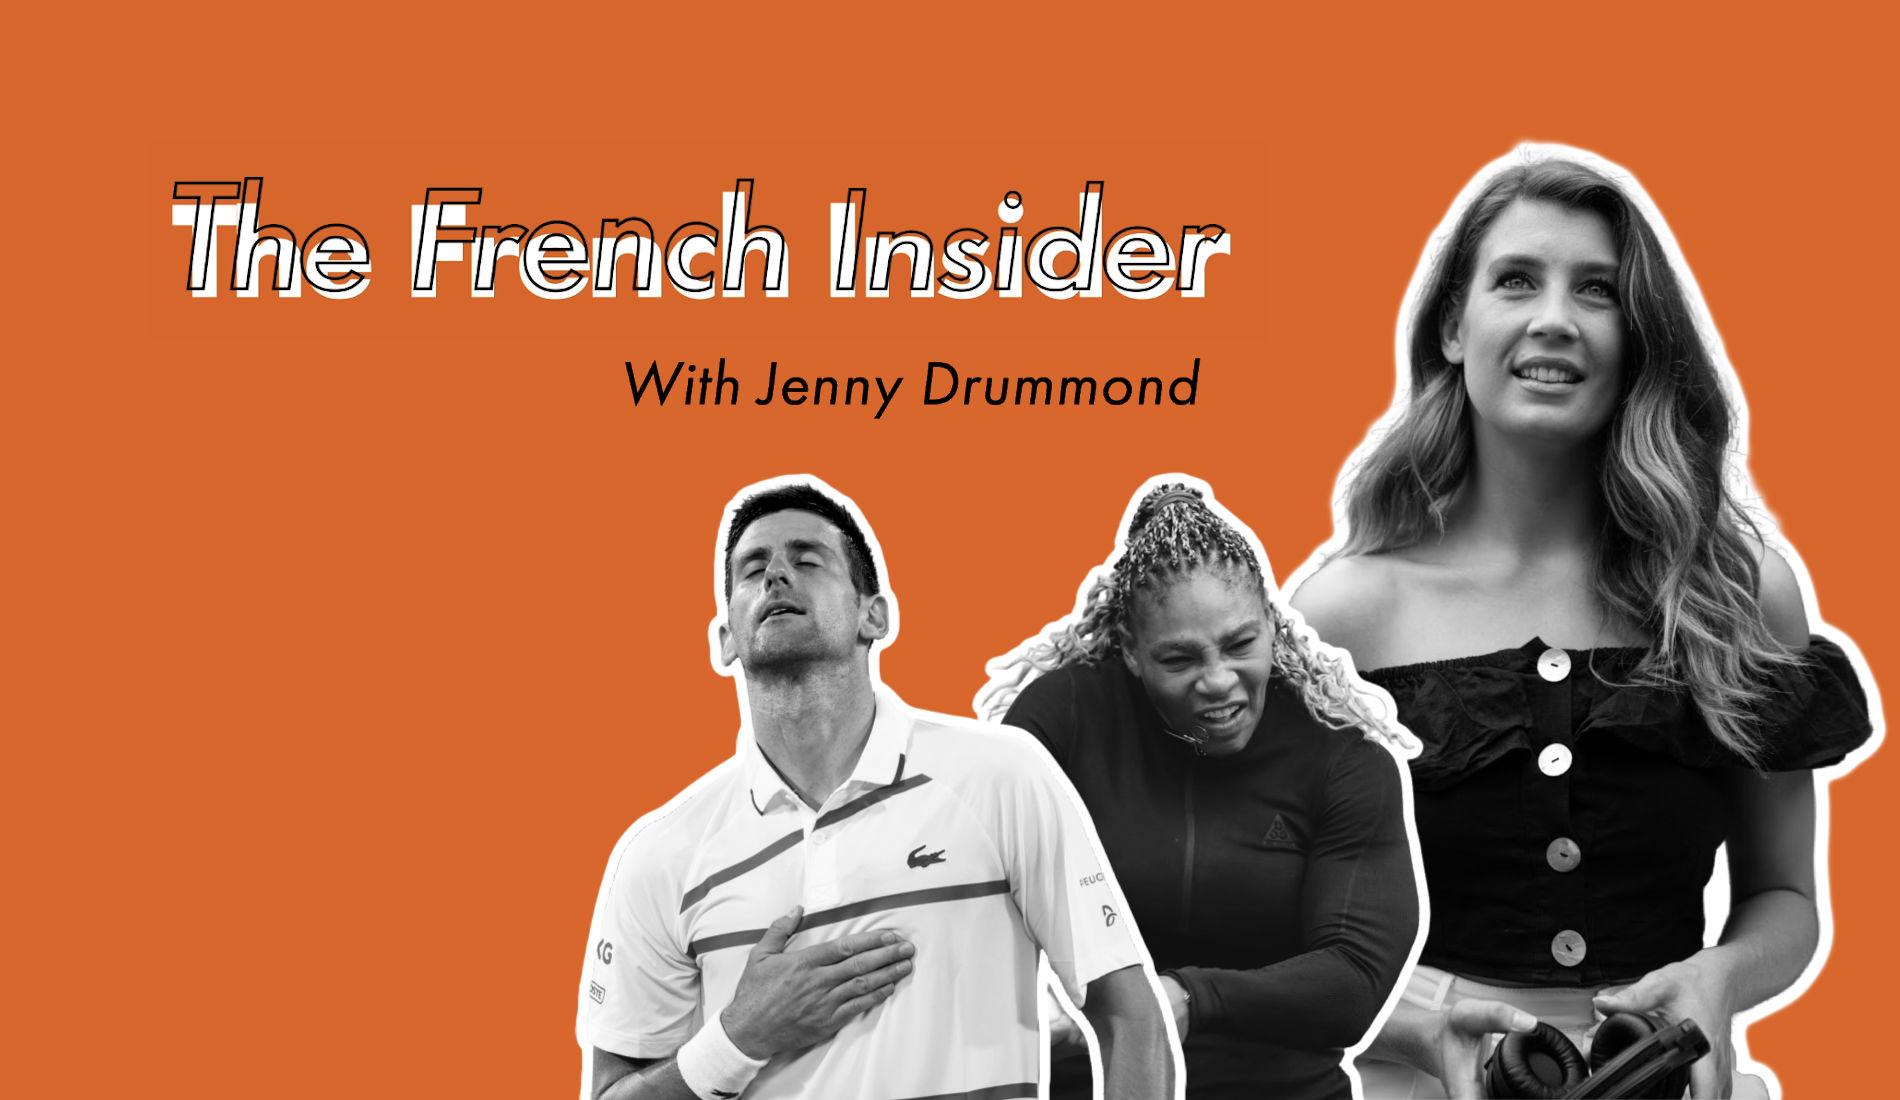 The French Insider #3 - Roland-Garros: Serena Williams & Novak Djokovic